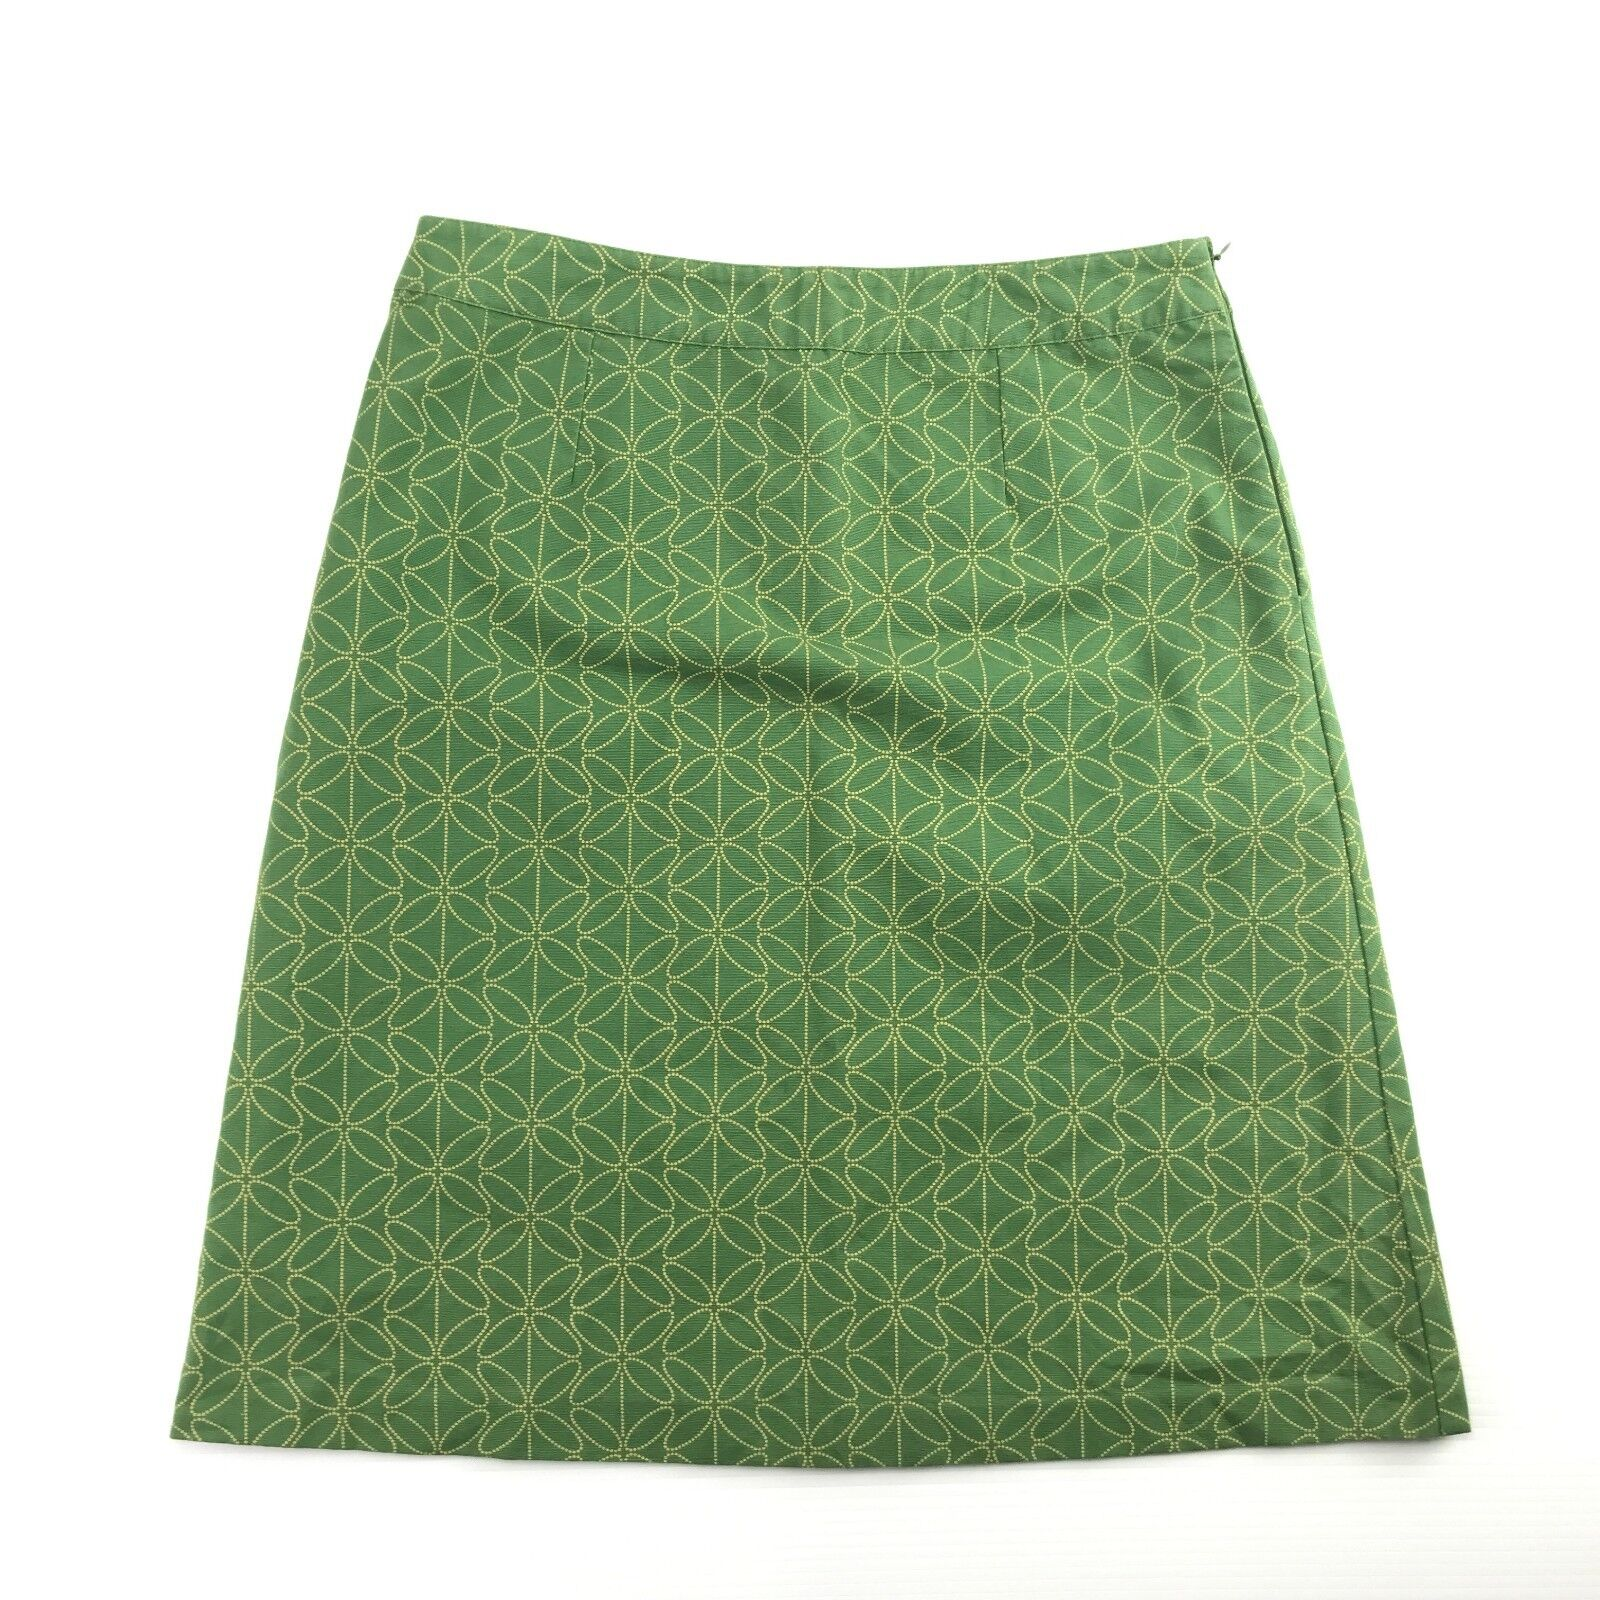 Boden Womens Green Geometric Print Cotton Lined A Line Career Skirt 12R